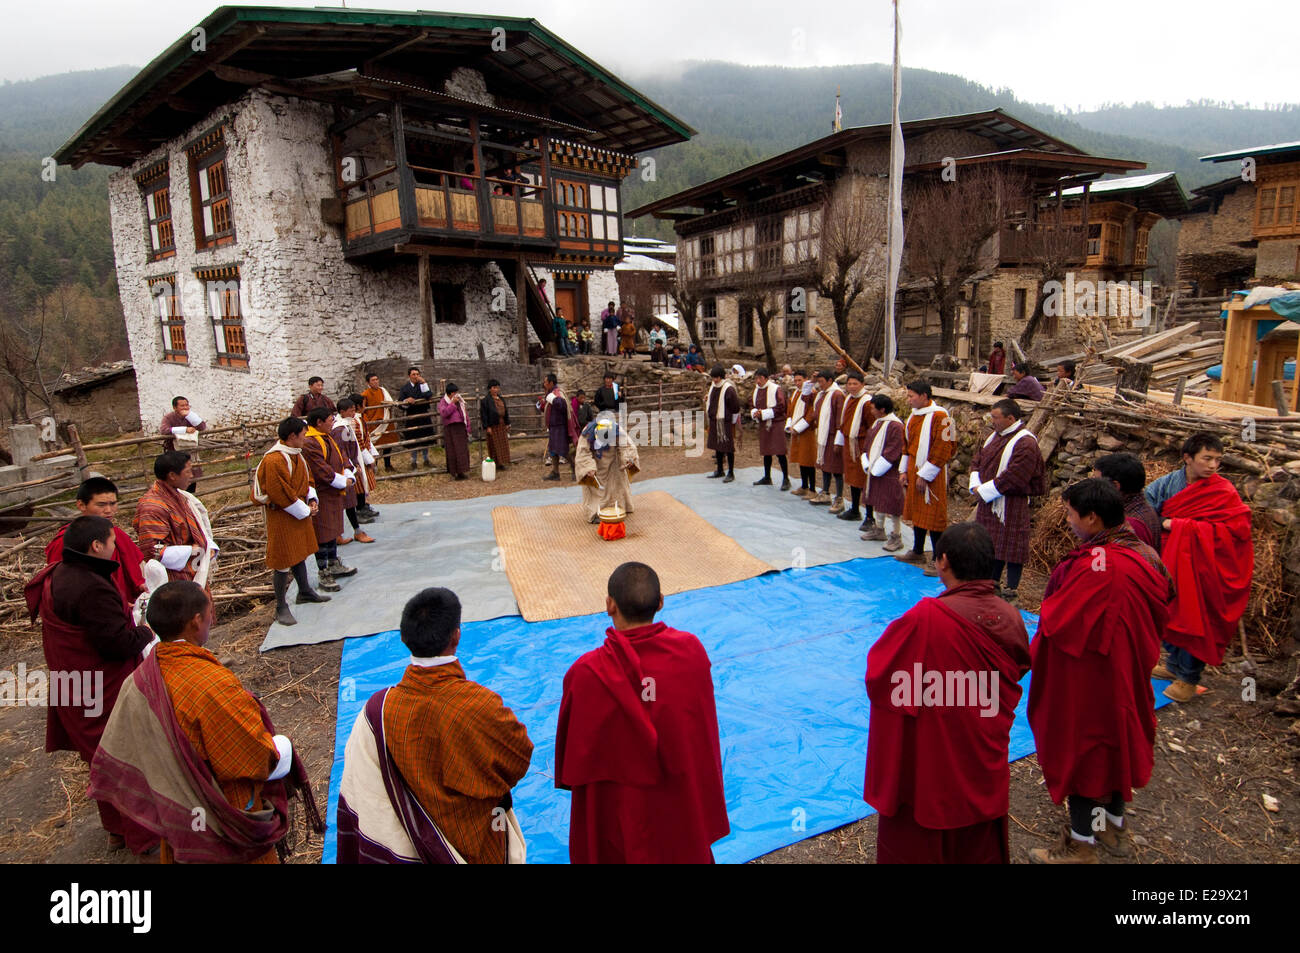 Bhutan, Bumthang valley, nyingmapa ritual during the Tangsibi festival - Stock Image